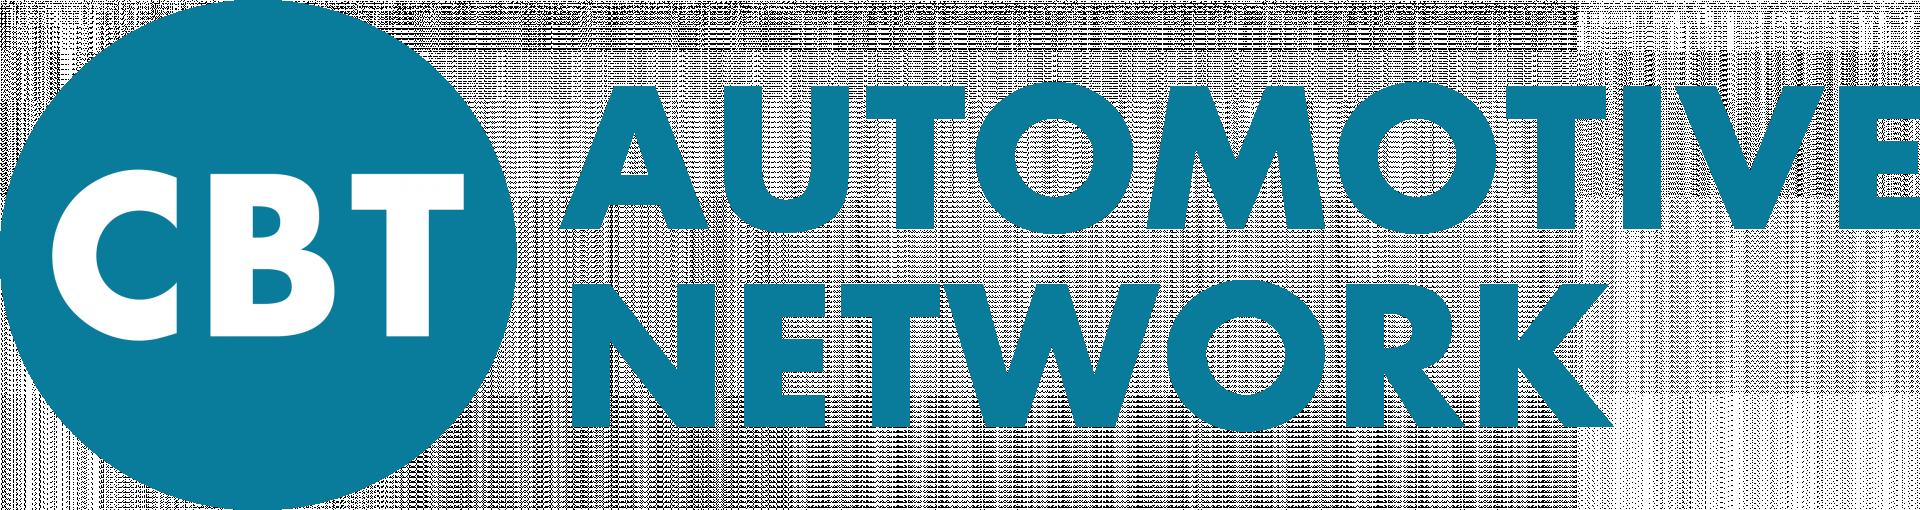 cb_automotive_network.png